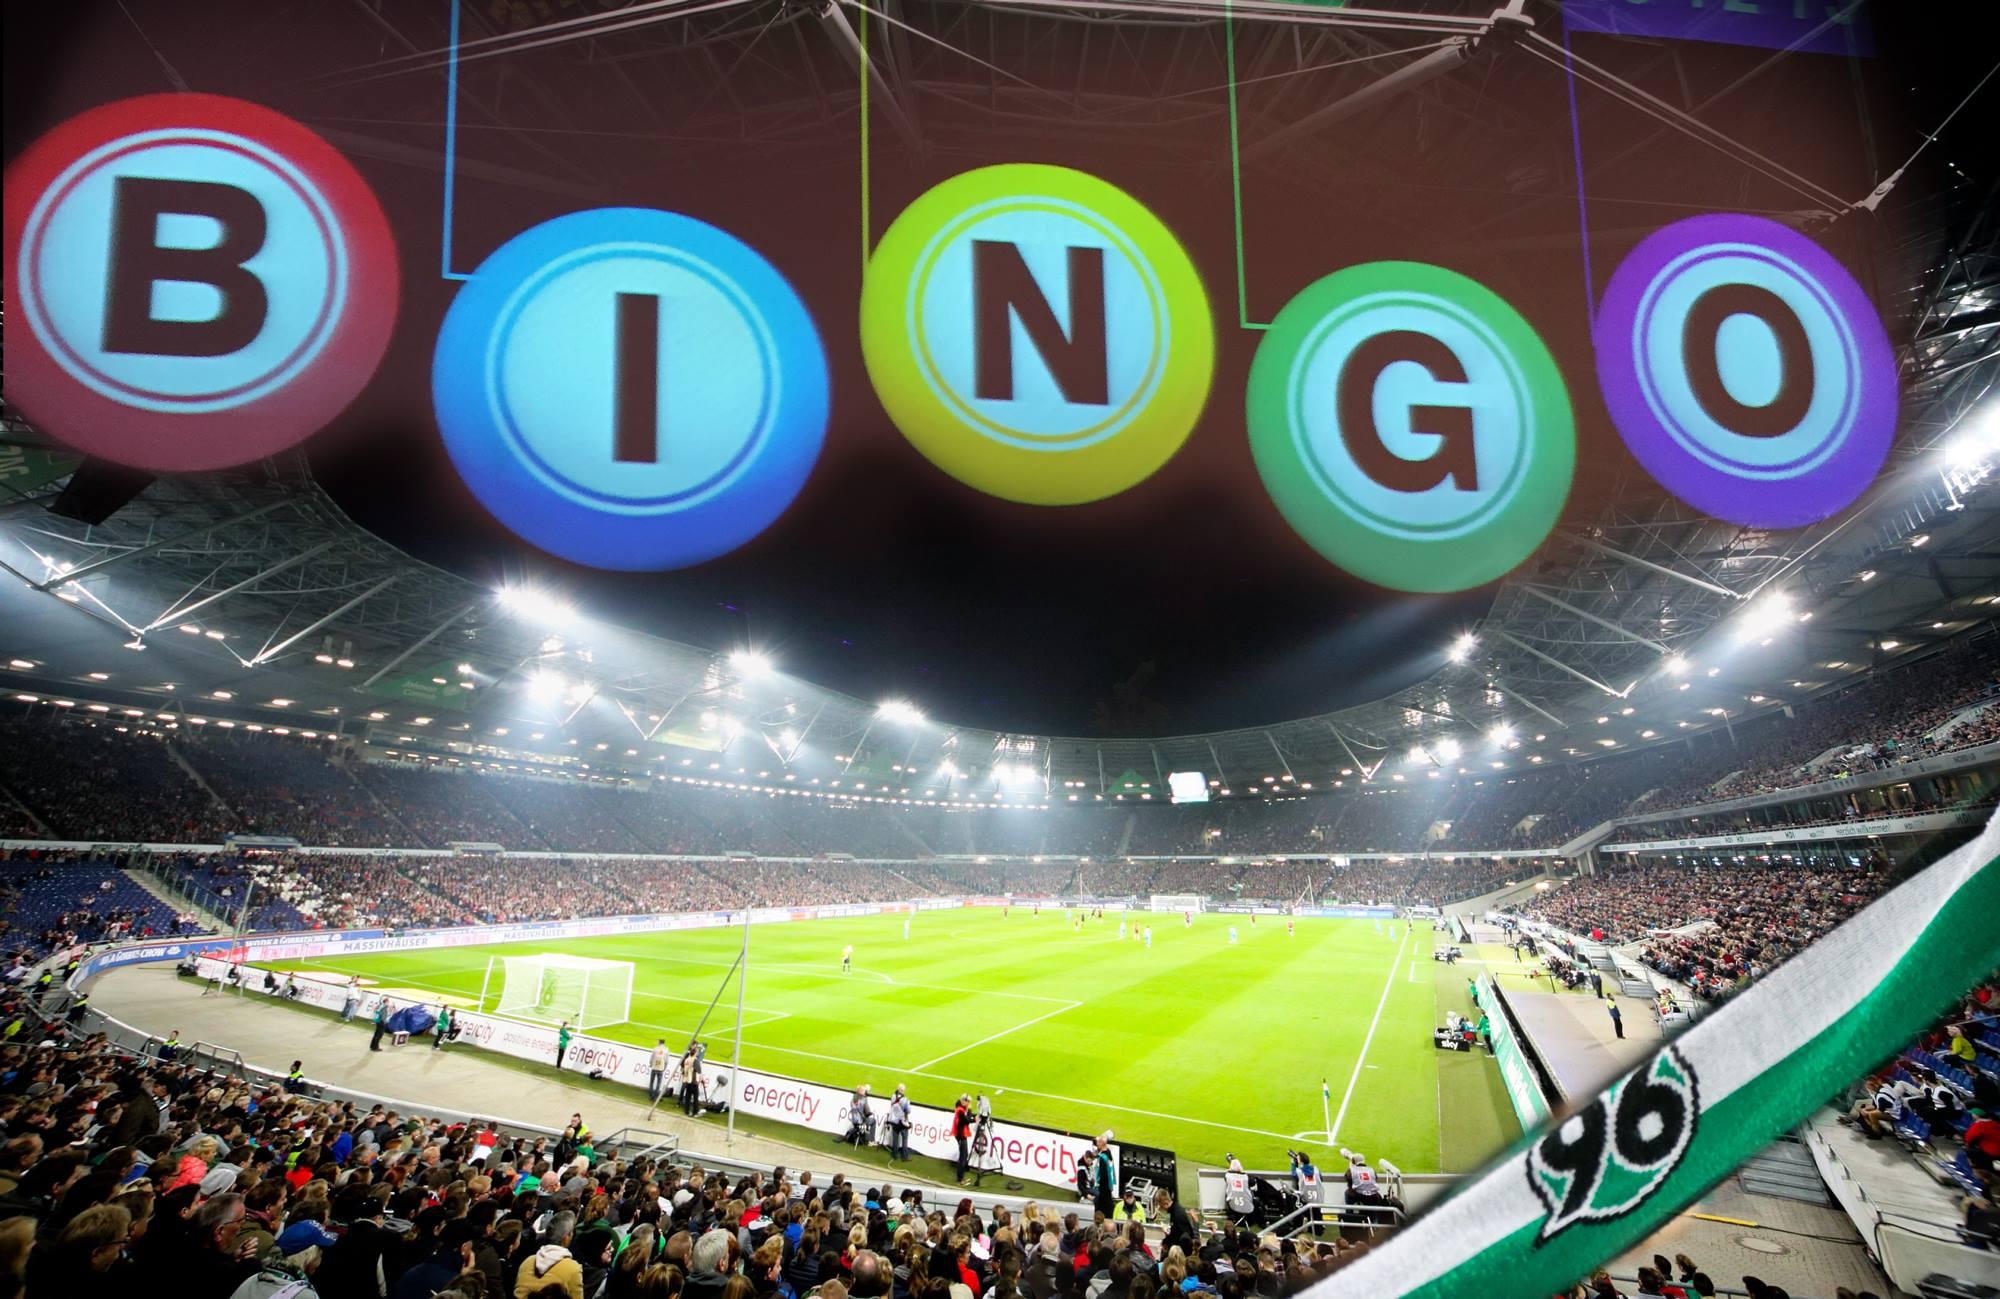 Bingo Spielbank Hannover